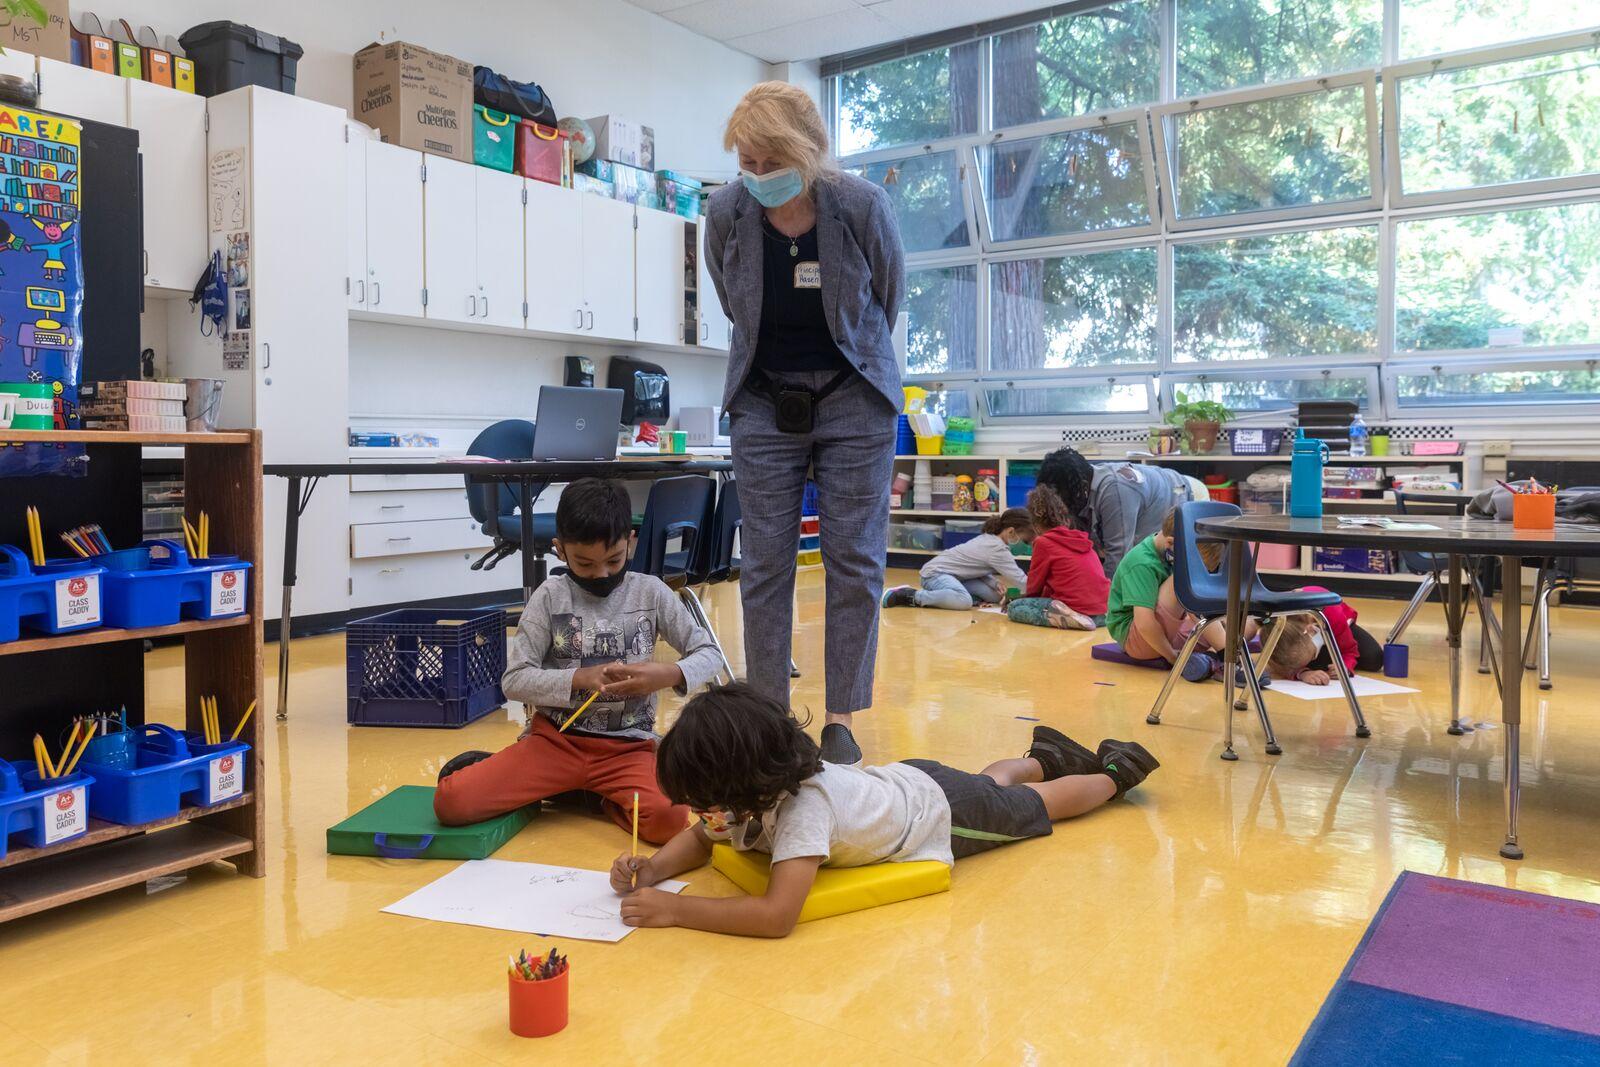 Washington Elementary School Principal Katia Hazen looks in on a first grade class  on August 16, 2021. Credit: Kelly Sullivan